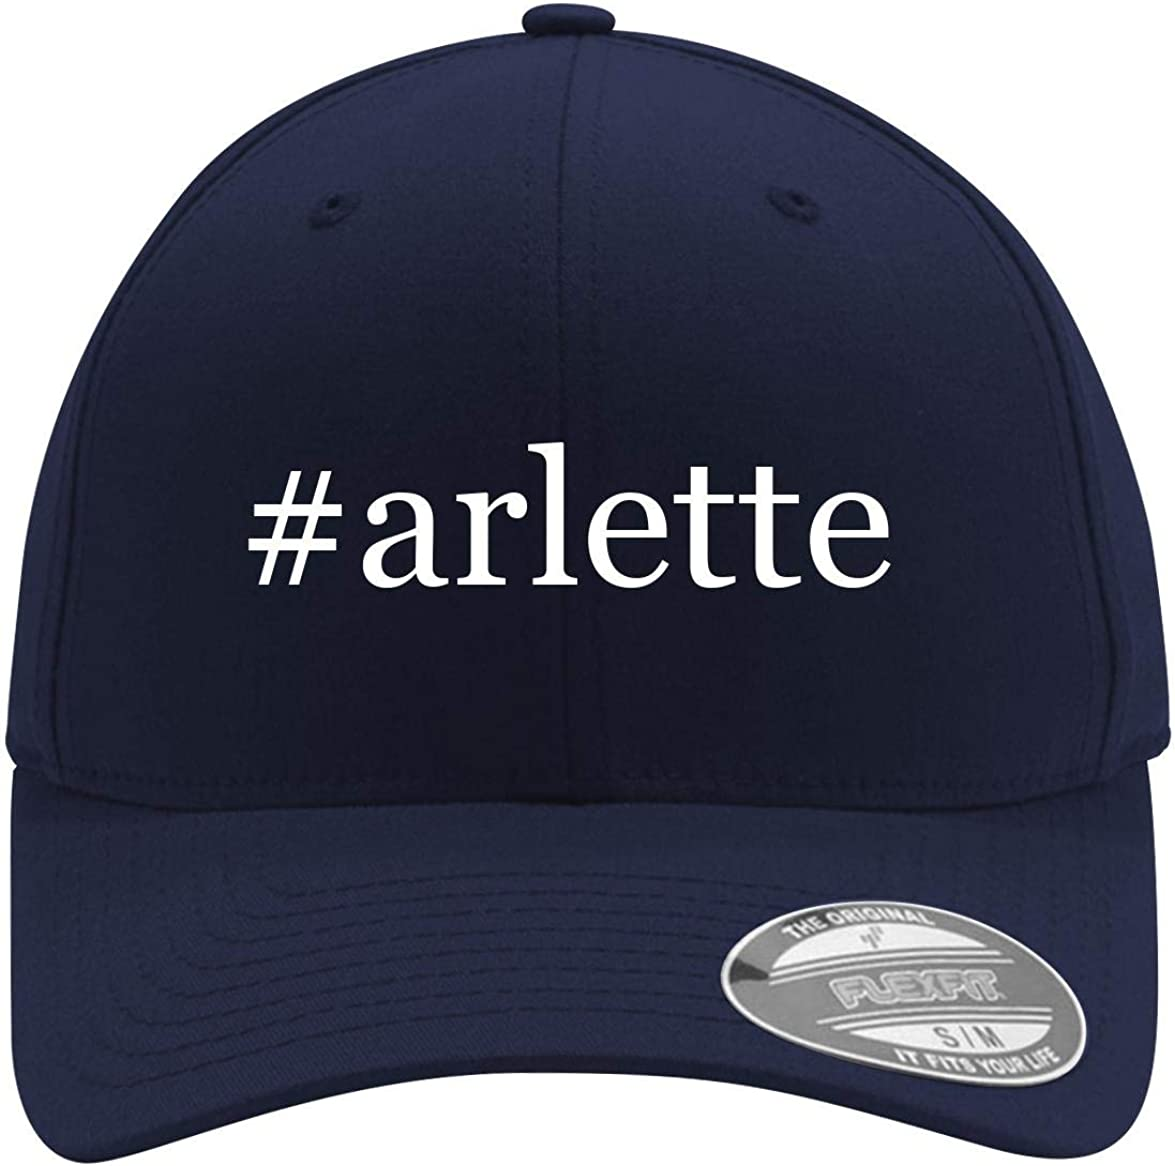 #arlette - Adult Men's Hashtag Flexfit Baseball Hat Cap